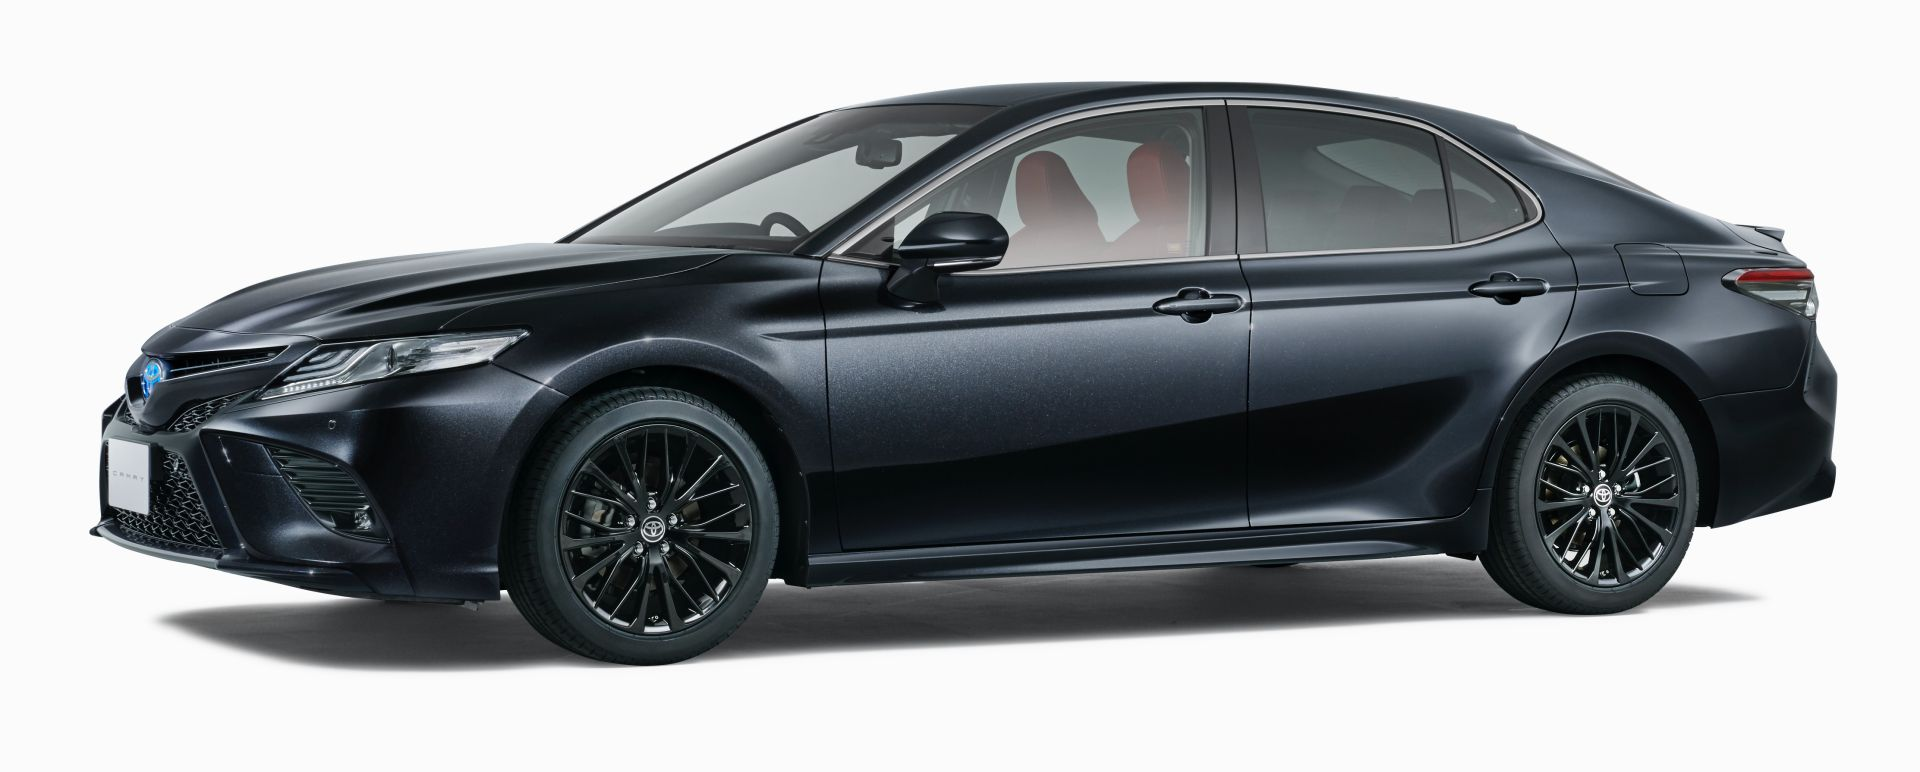 2020 Toyota Camry Black Edition JDM spec 3